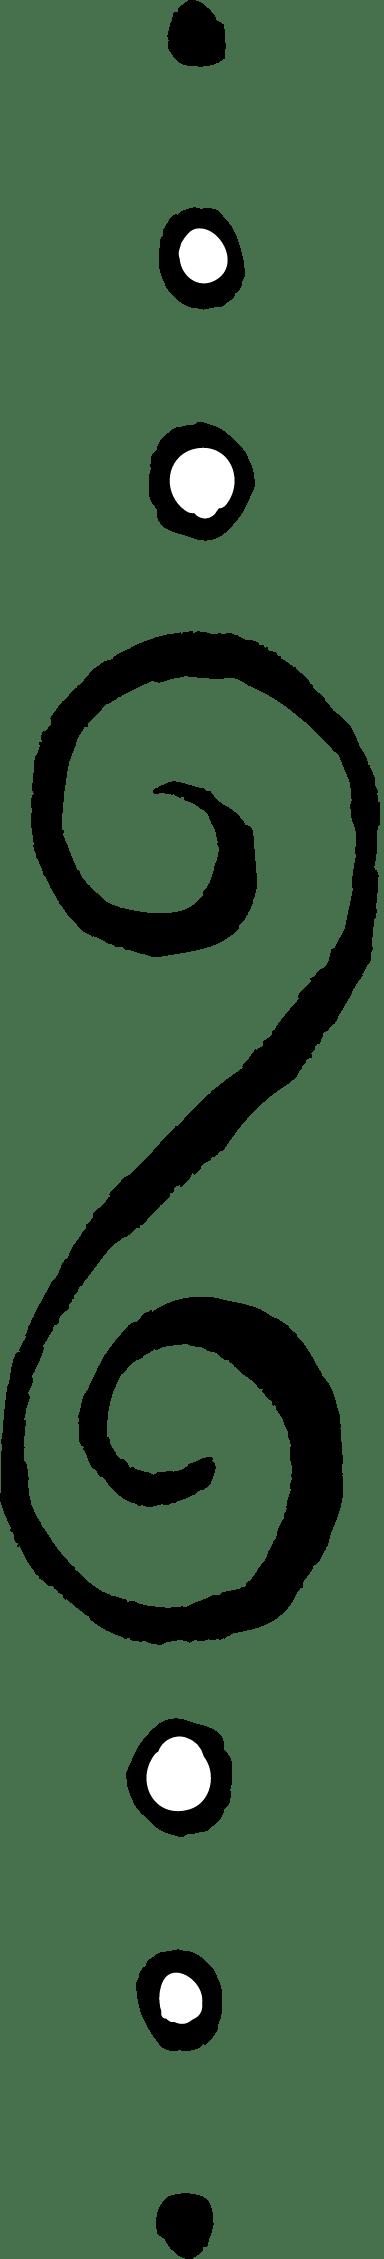 Curvilinear Flourish